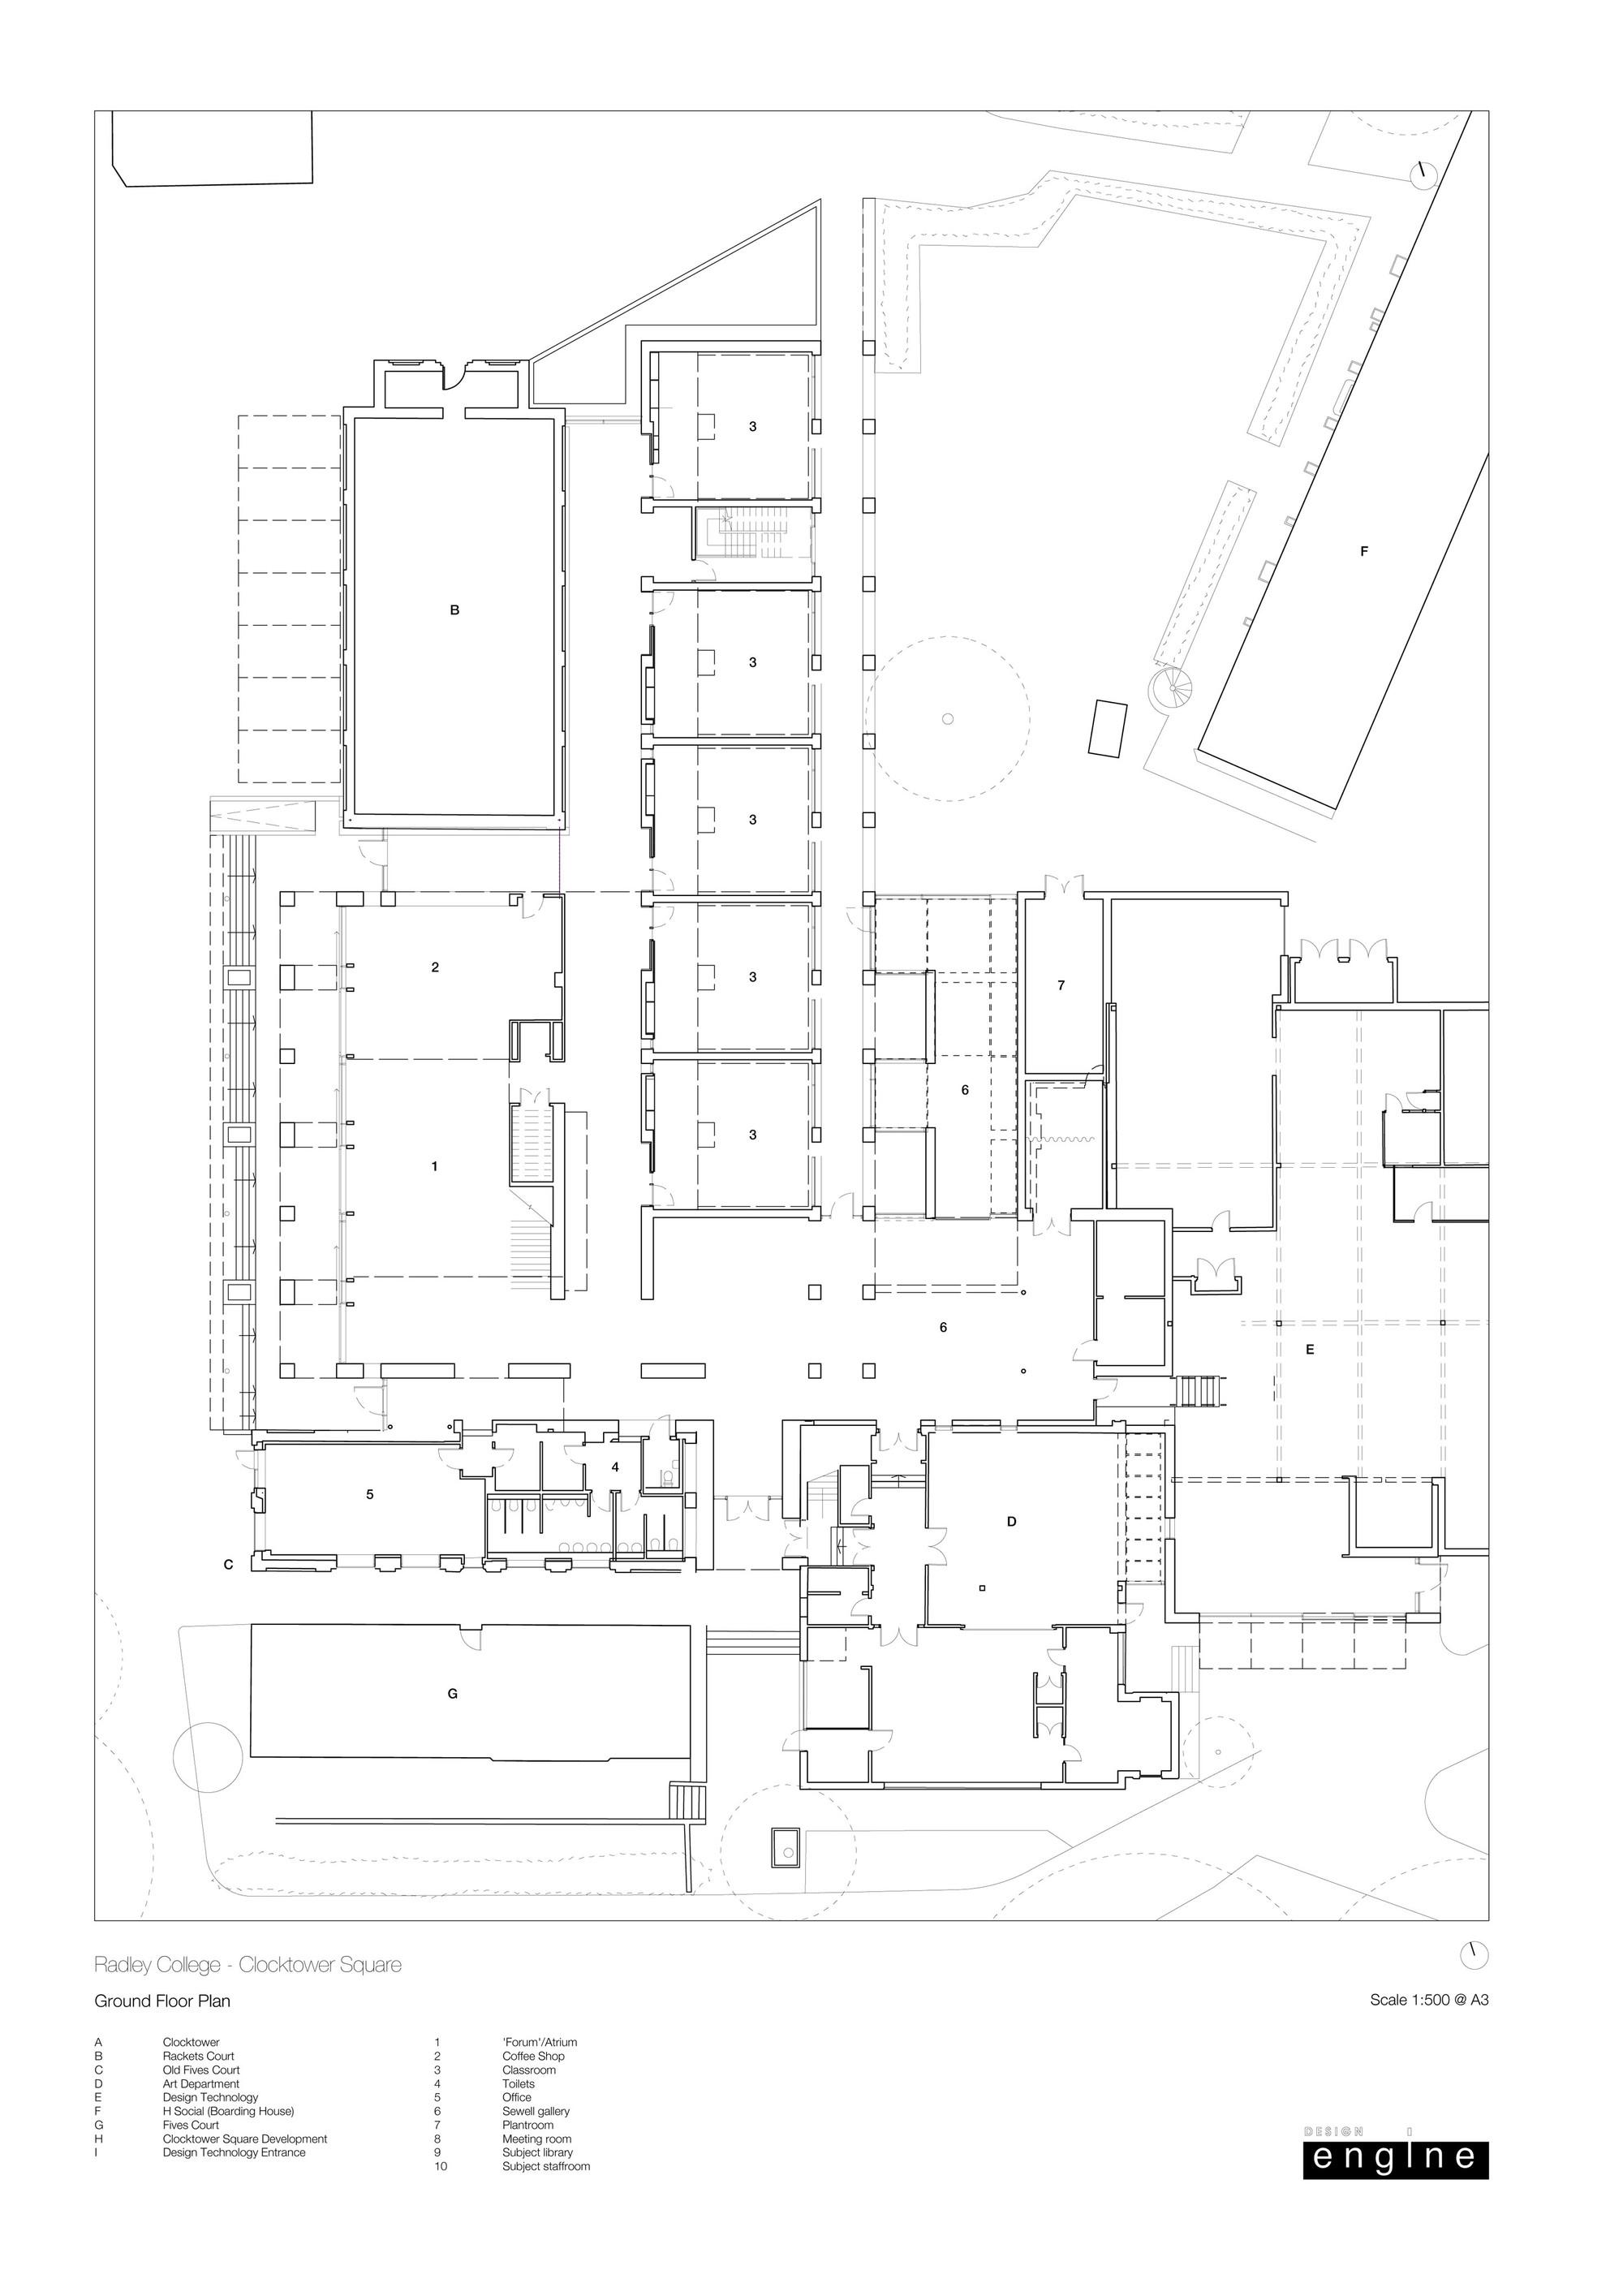 2000x2829 Gallery Of Radley College Design Engine Architects